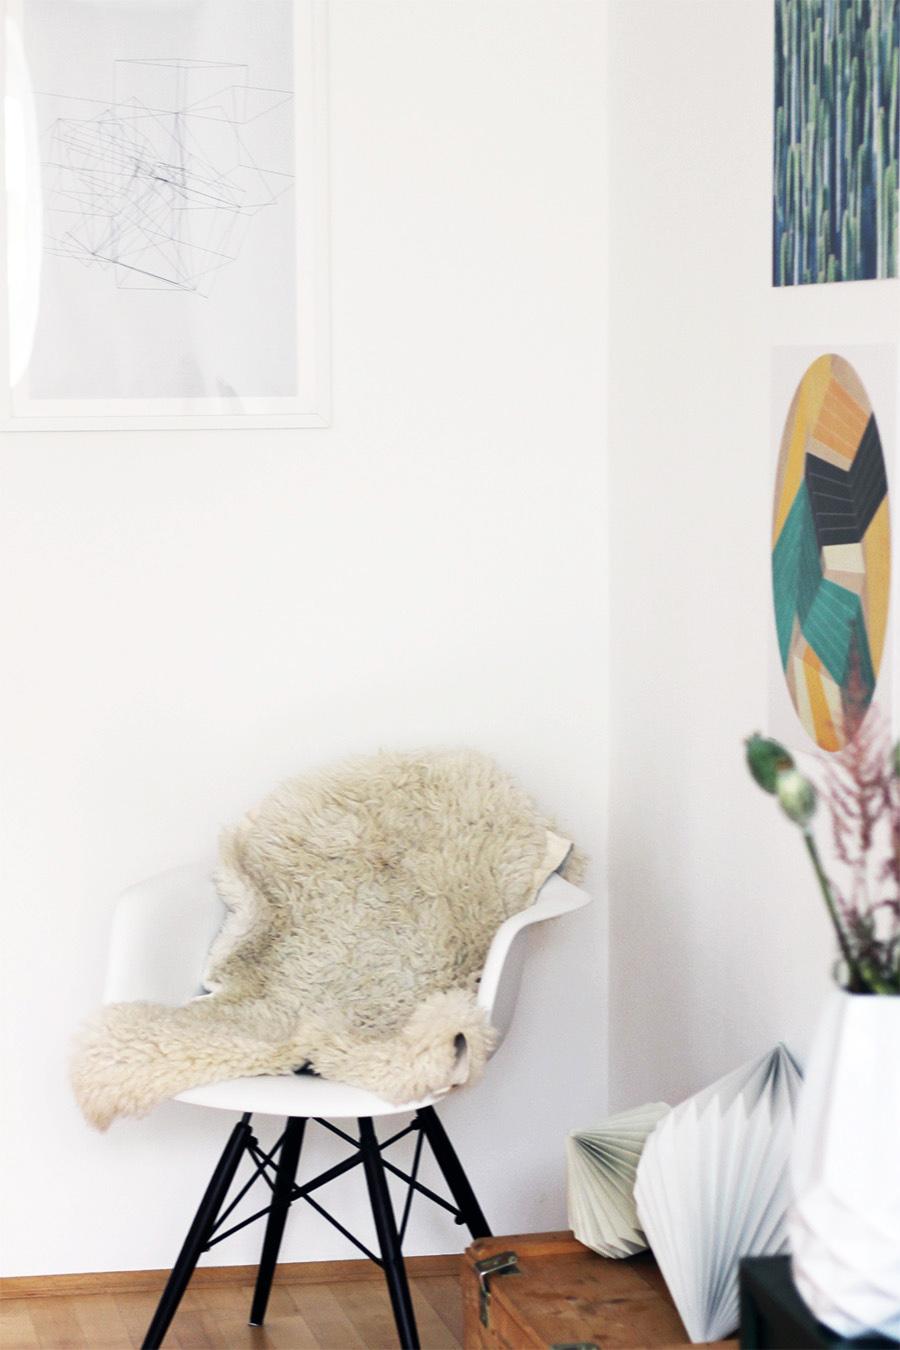 NicetohaveMag_Posterlounge_Prints_Interior_SwedischesDesign_Kaktus